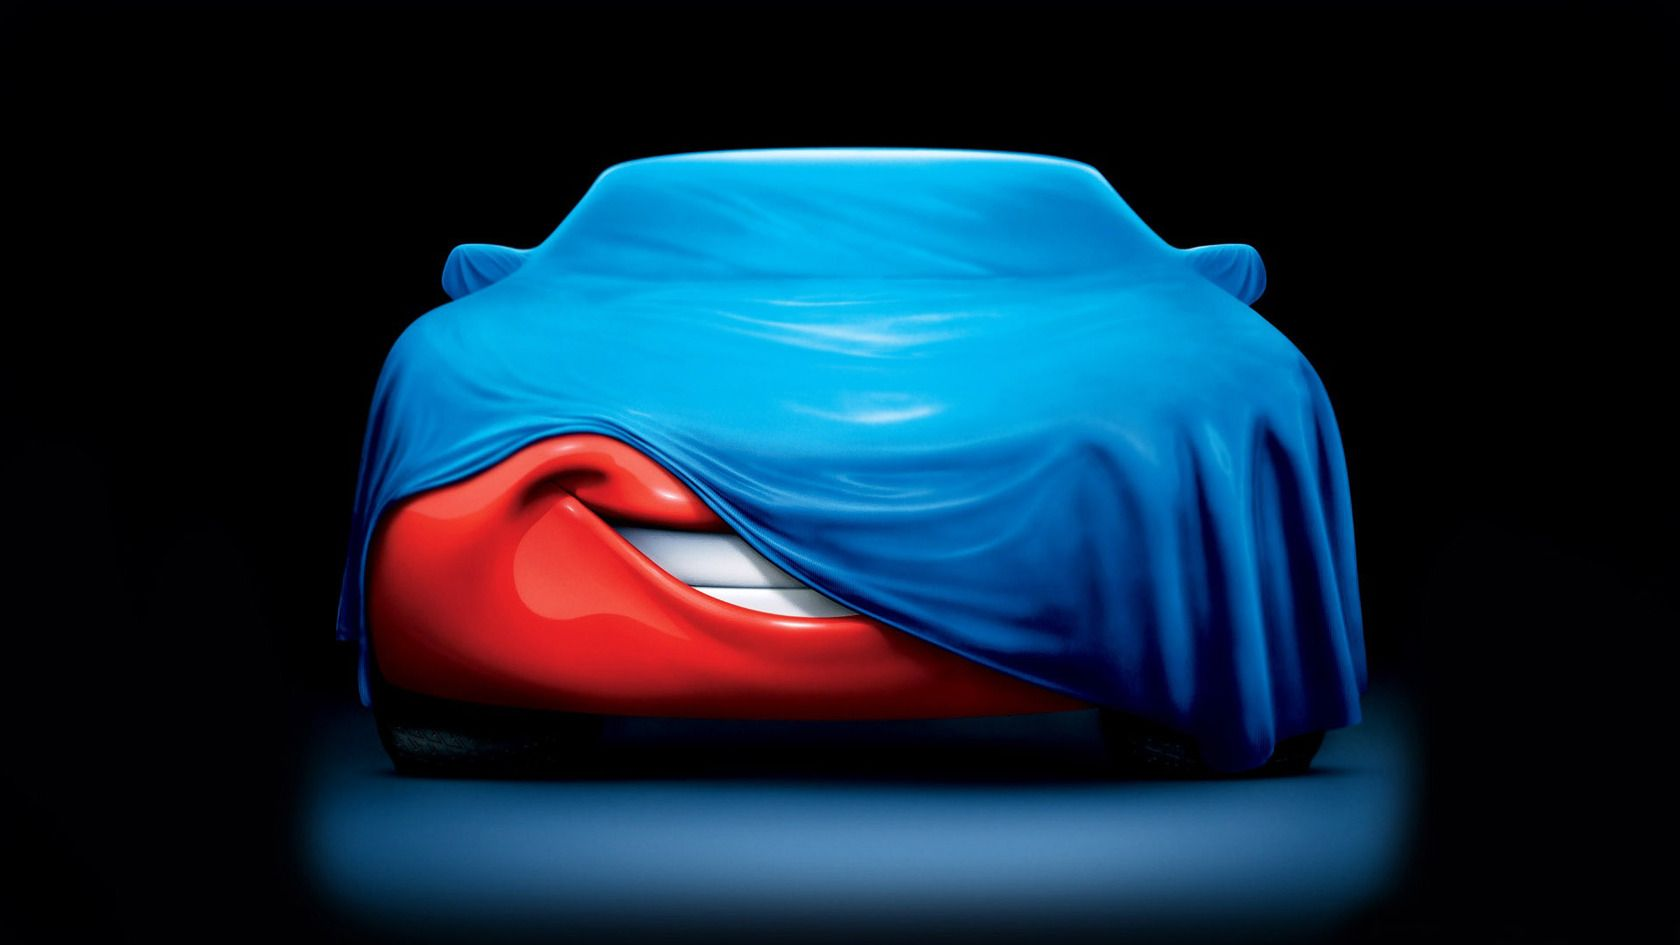 Cartoon Cool Lightning McQueen - Cars WallPaper HD - http://imashon.com/cartoon/cartoon-cool-lightning-mcqueen-cars-wallpaper-hd.html